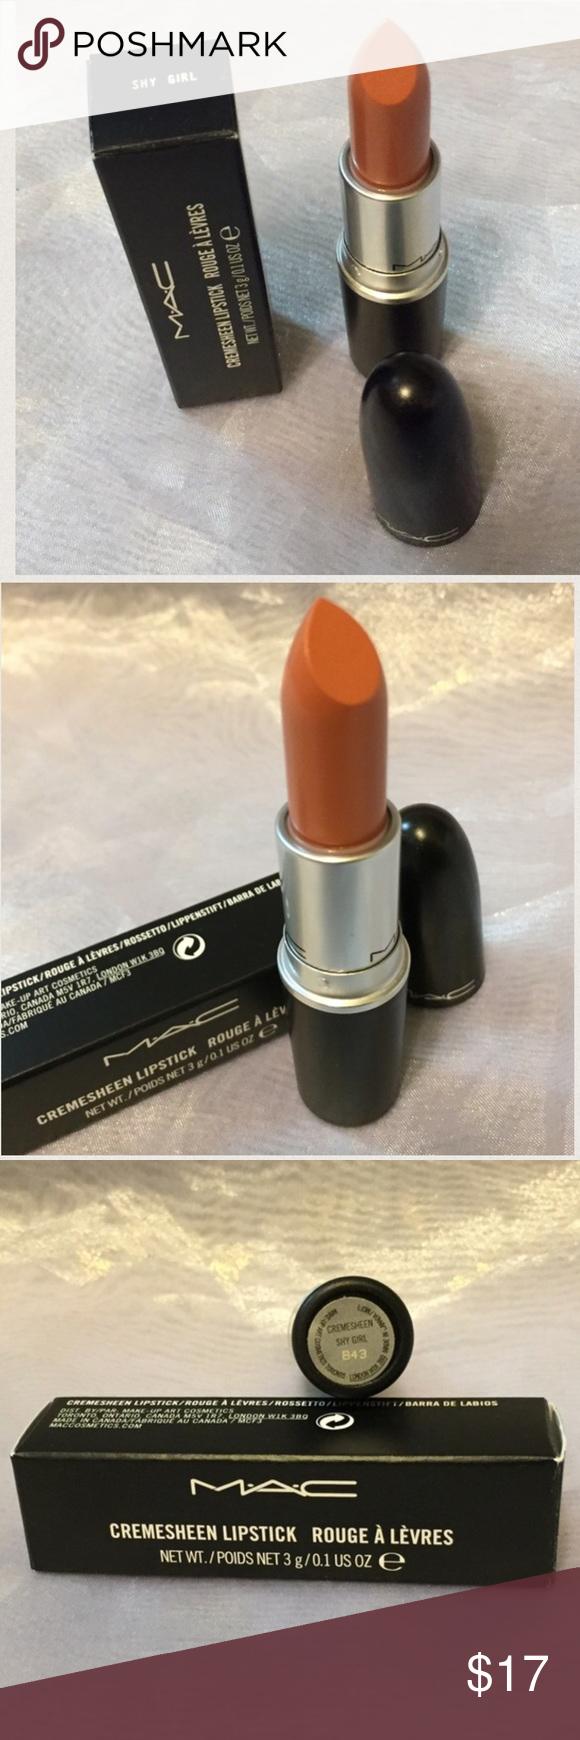 MAC Shy Girl Lipstick on Miley Cyrus - Best MAC Lipsticks